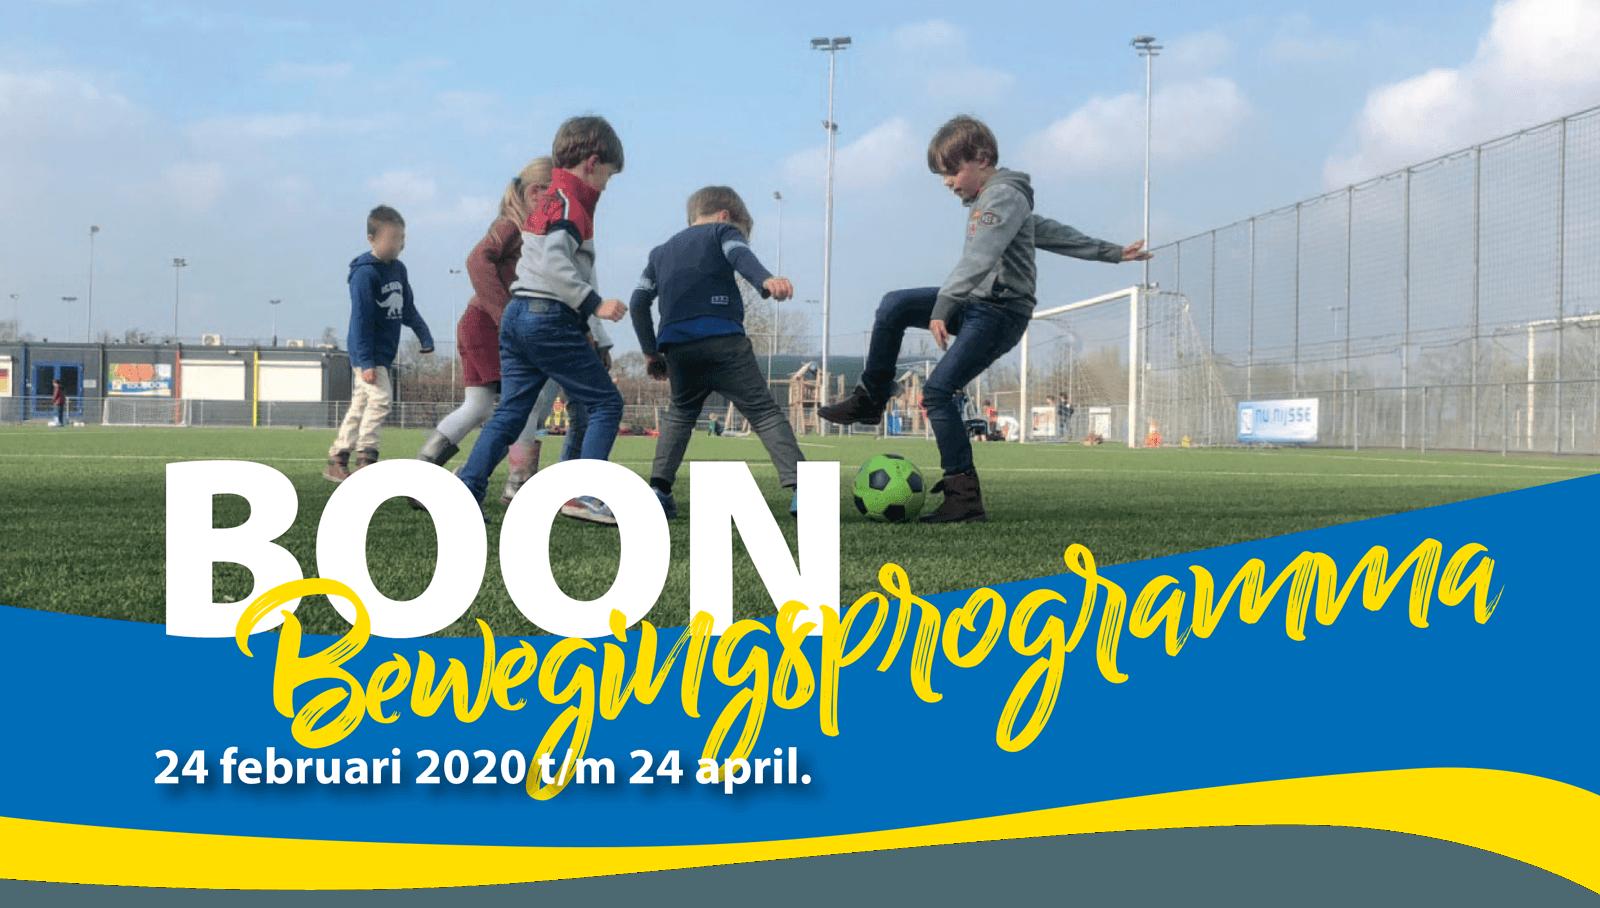 BOON-bewegingsprogramma-NL